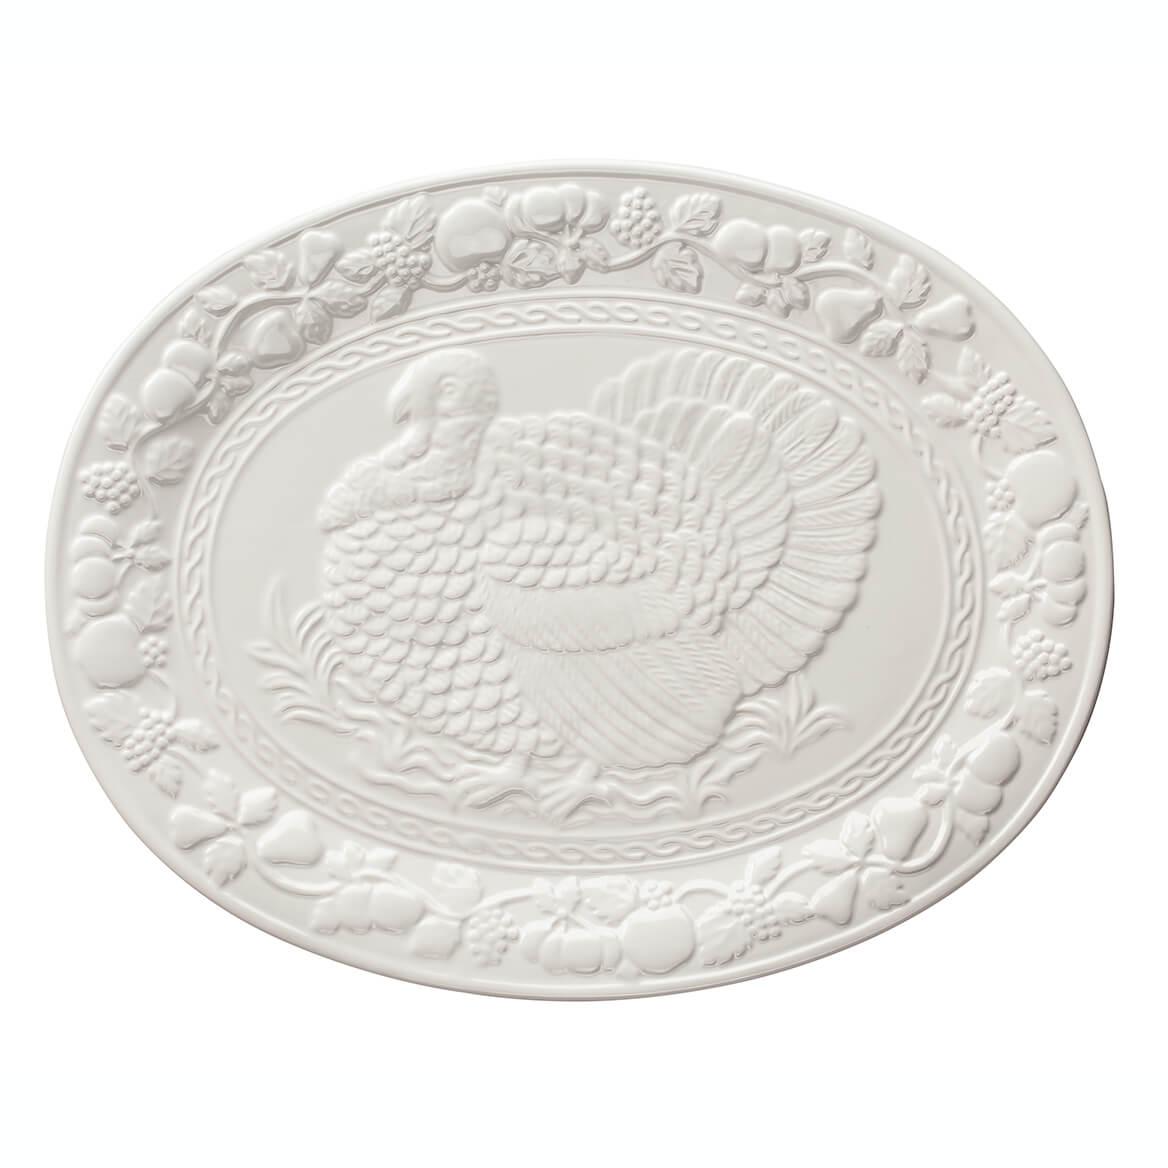 "William Roberts 17"" Oval Turkey Platter-363354"